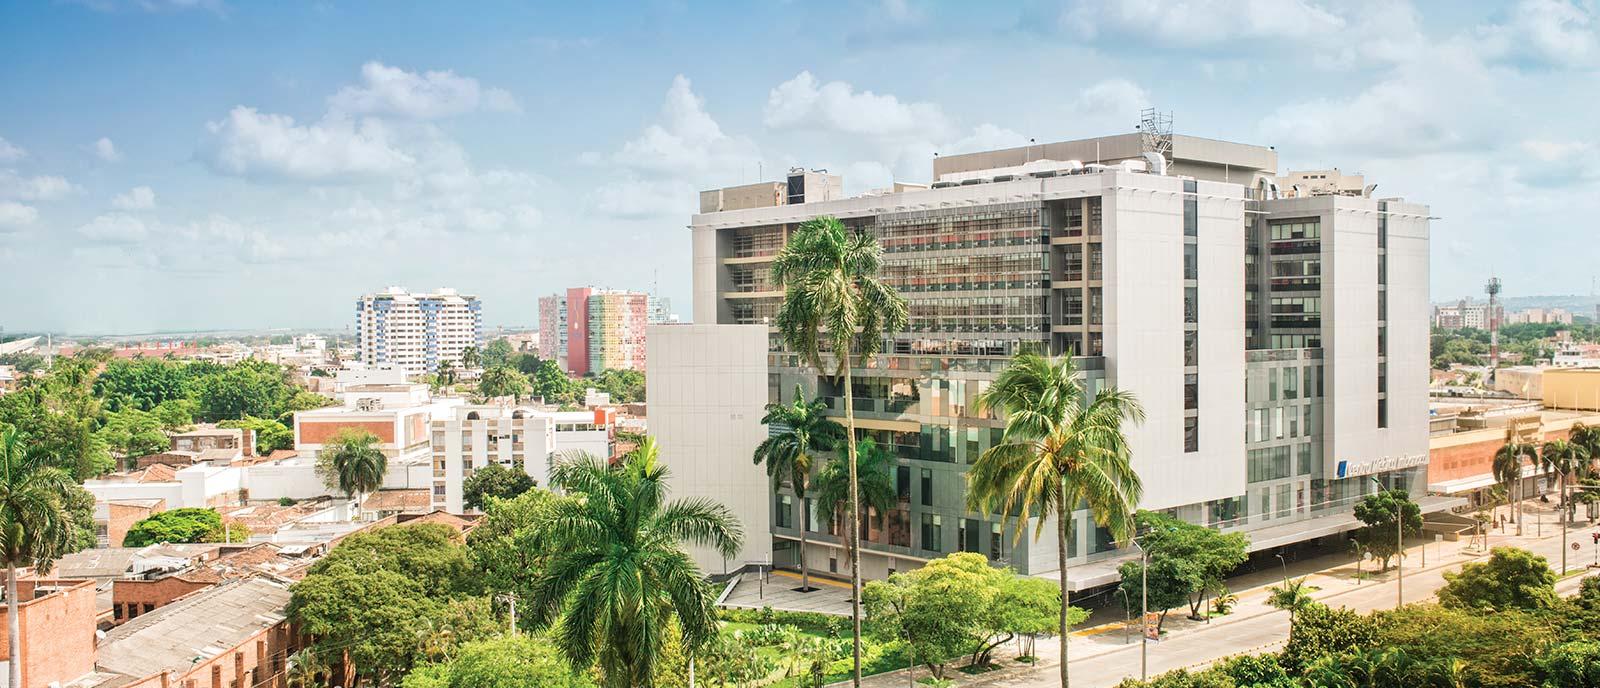 Nuestra Historia - Acerca de Centro Médico Imbanaco - Centro Médico ...